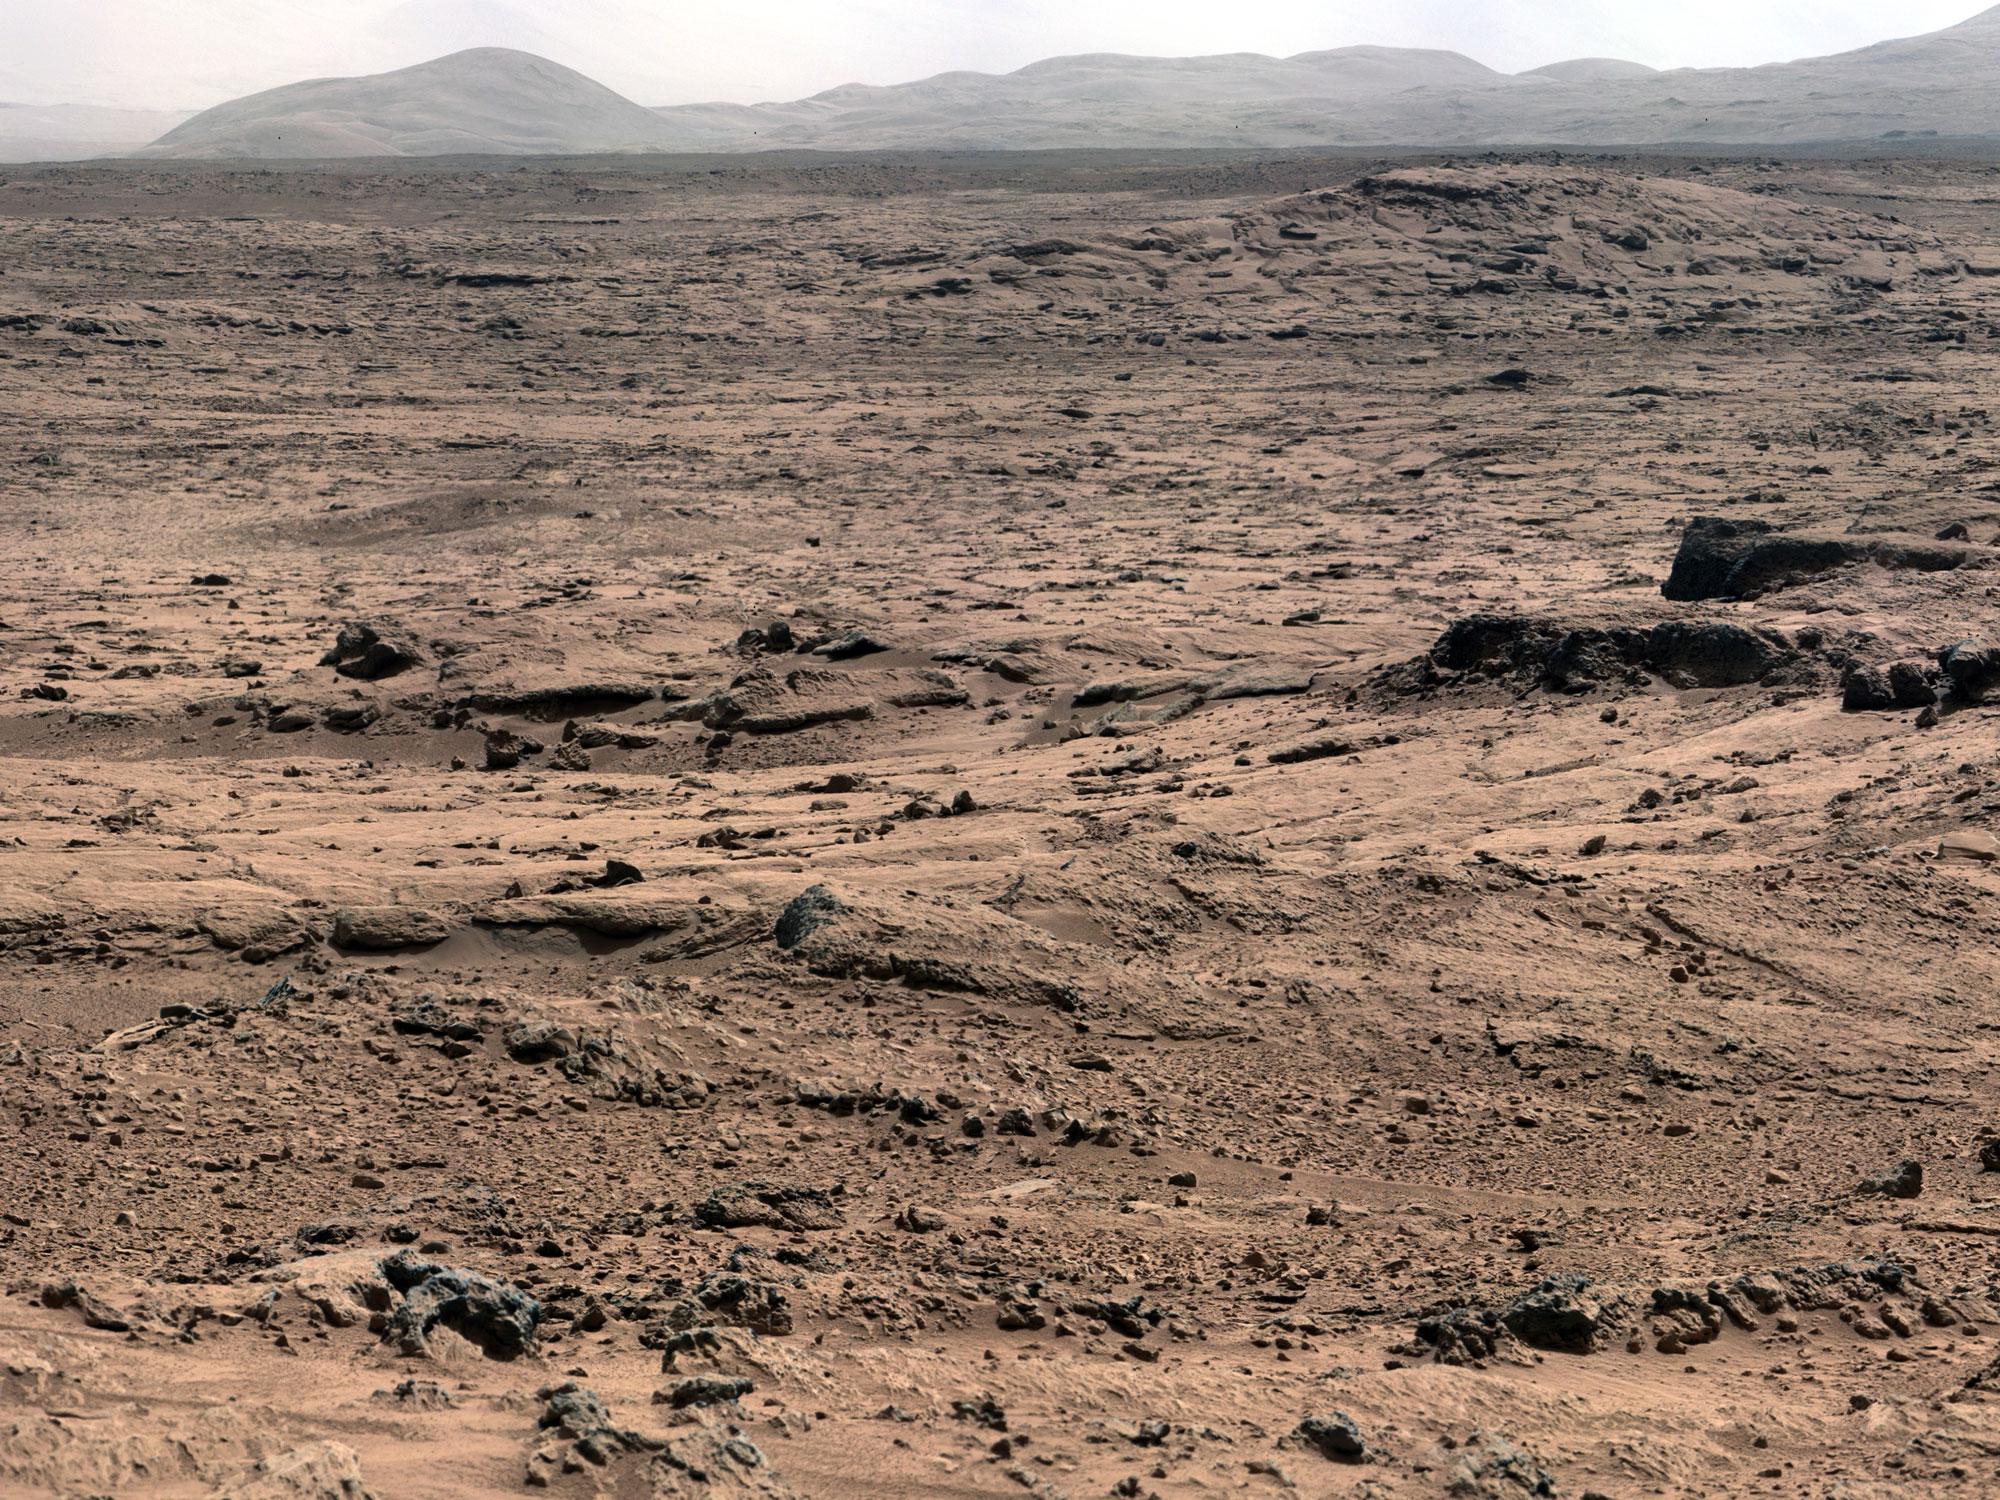 mars curiosity rover recent news - photo #10